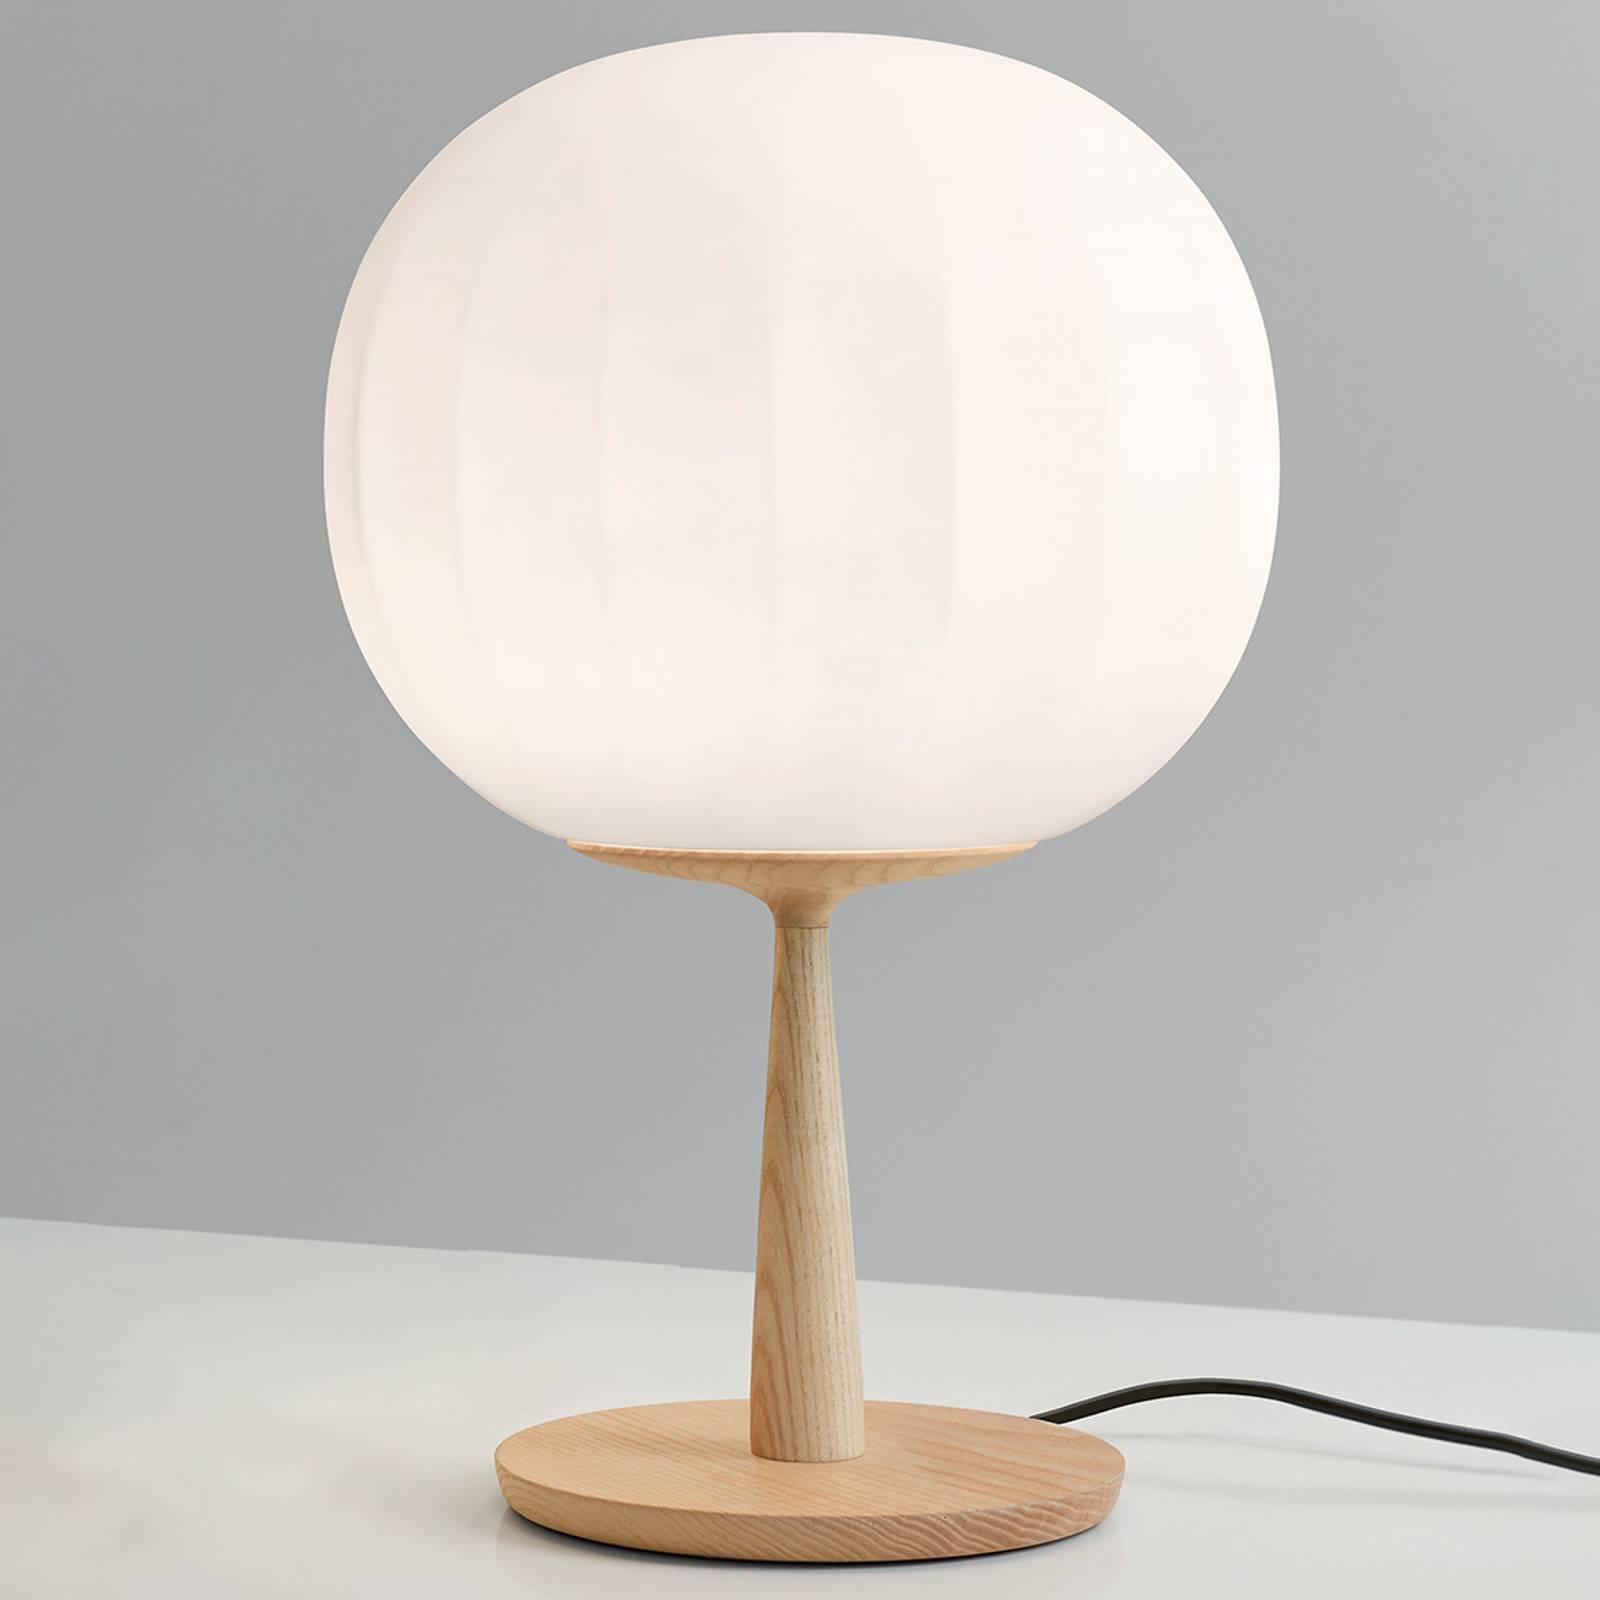 Luceplan bordlampe Lita fot i eiketre høyde 46 cm